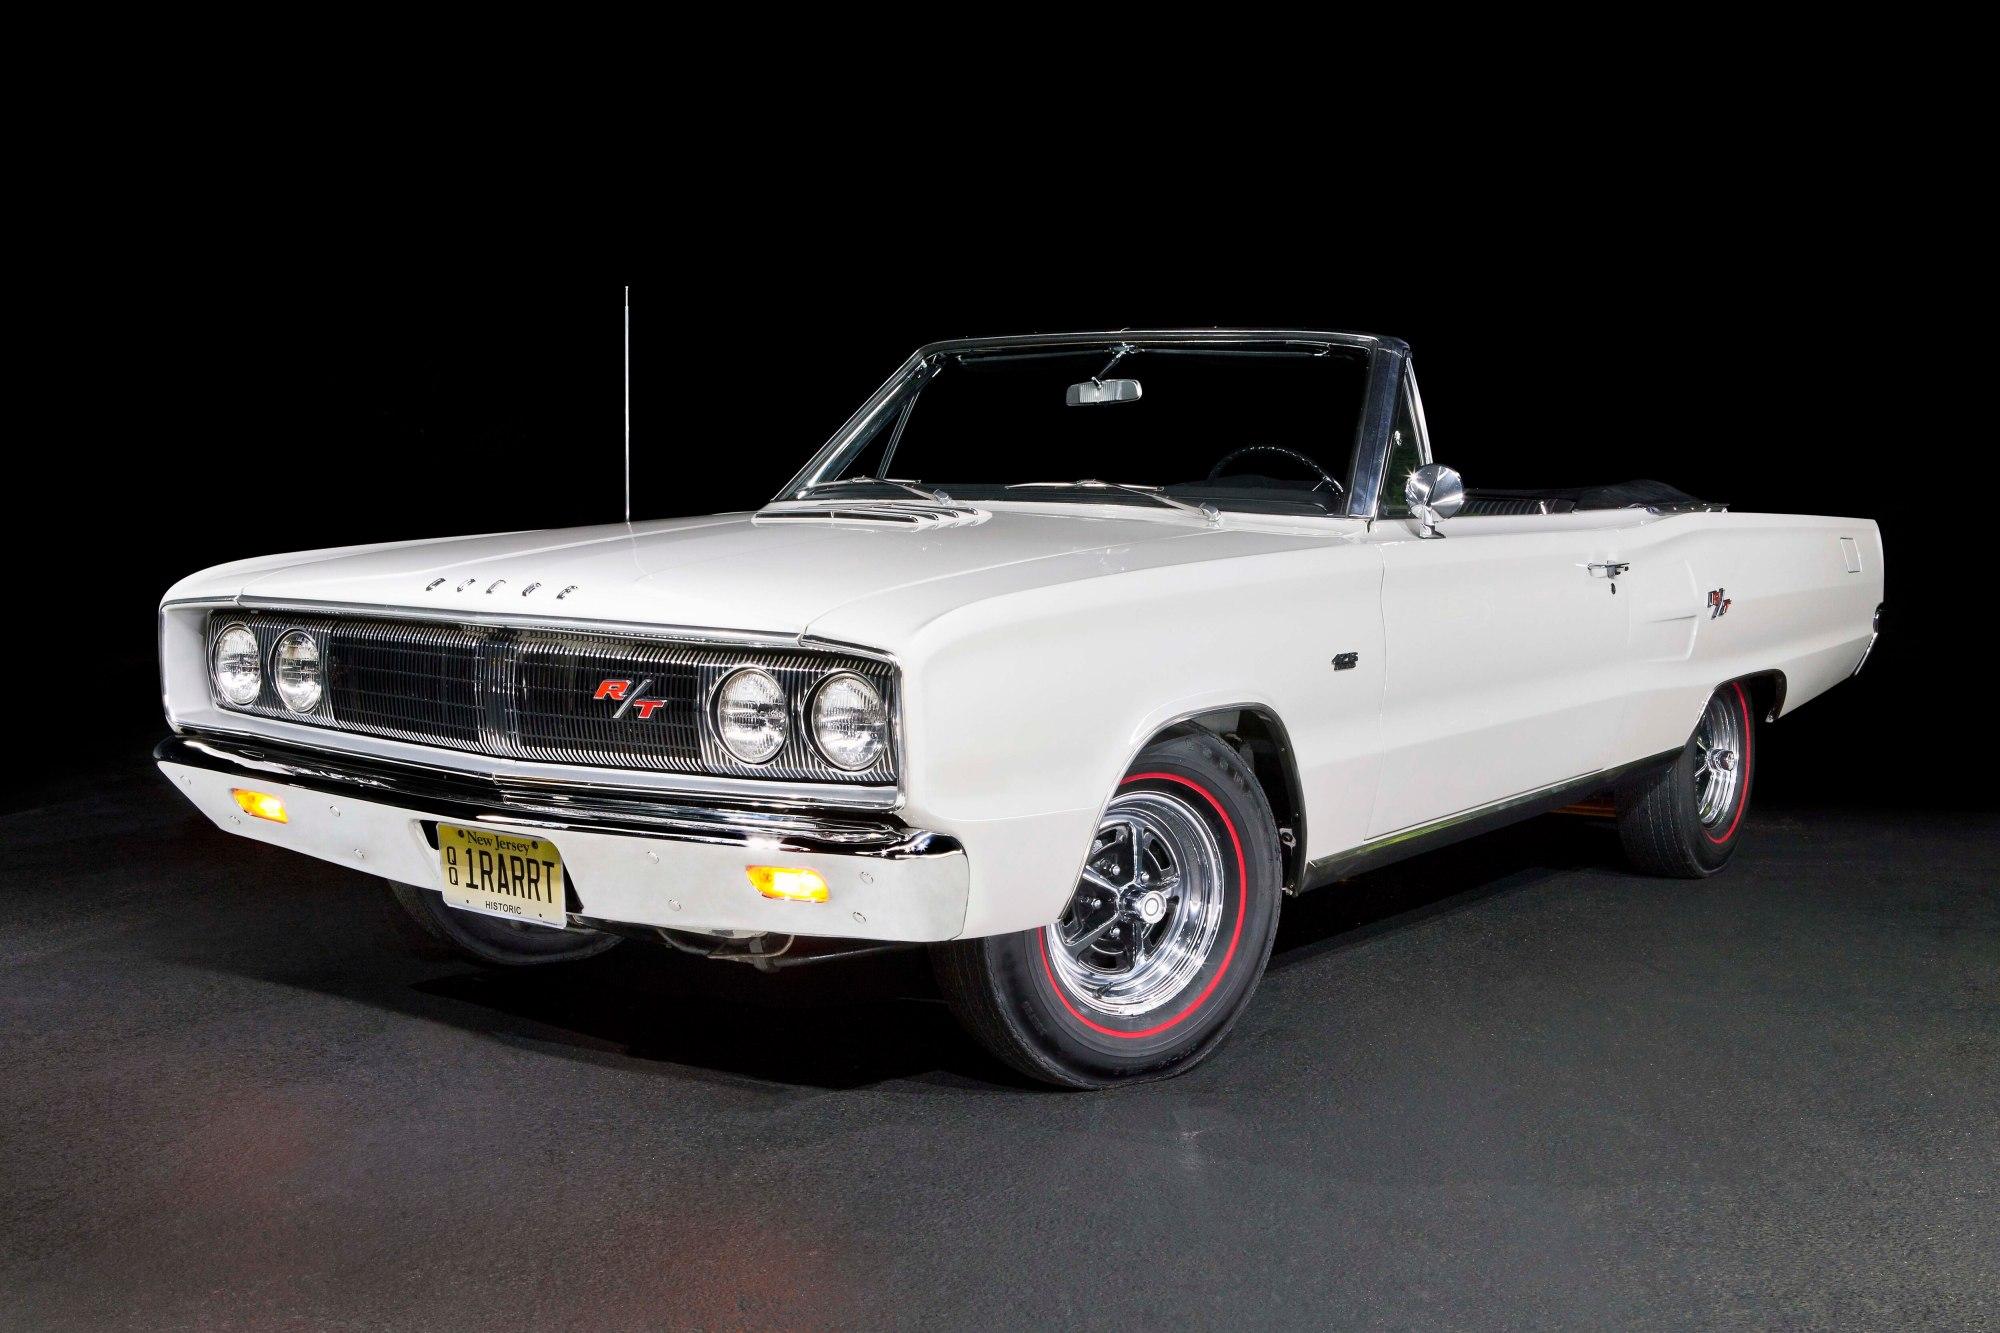 hight resolution of ultrarare 1967 dodge coronet r t hemi convertible bought sold thenultrarare 1967 dodge coronet r t